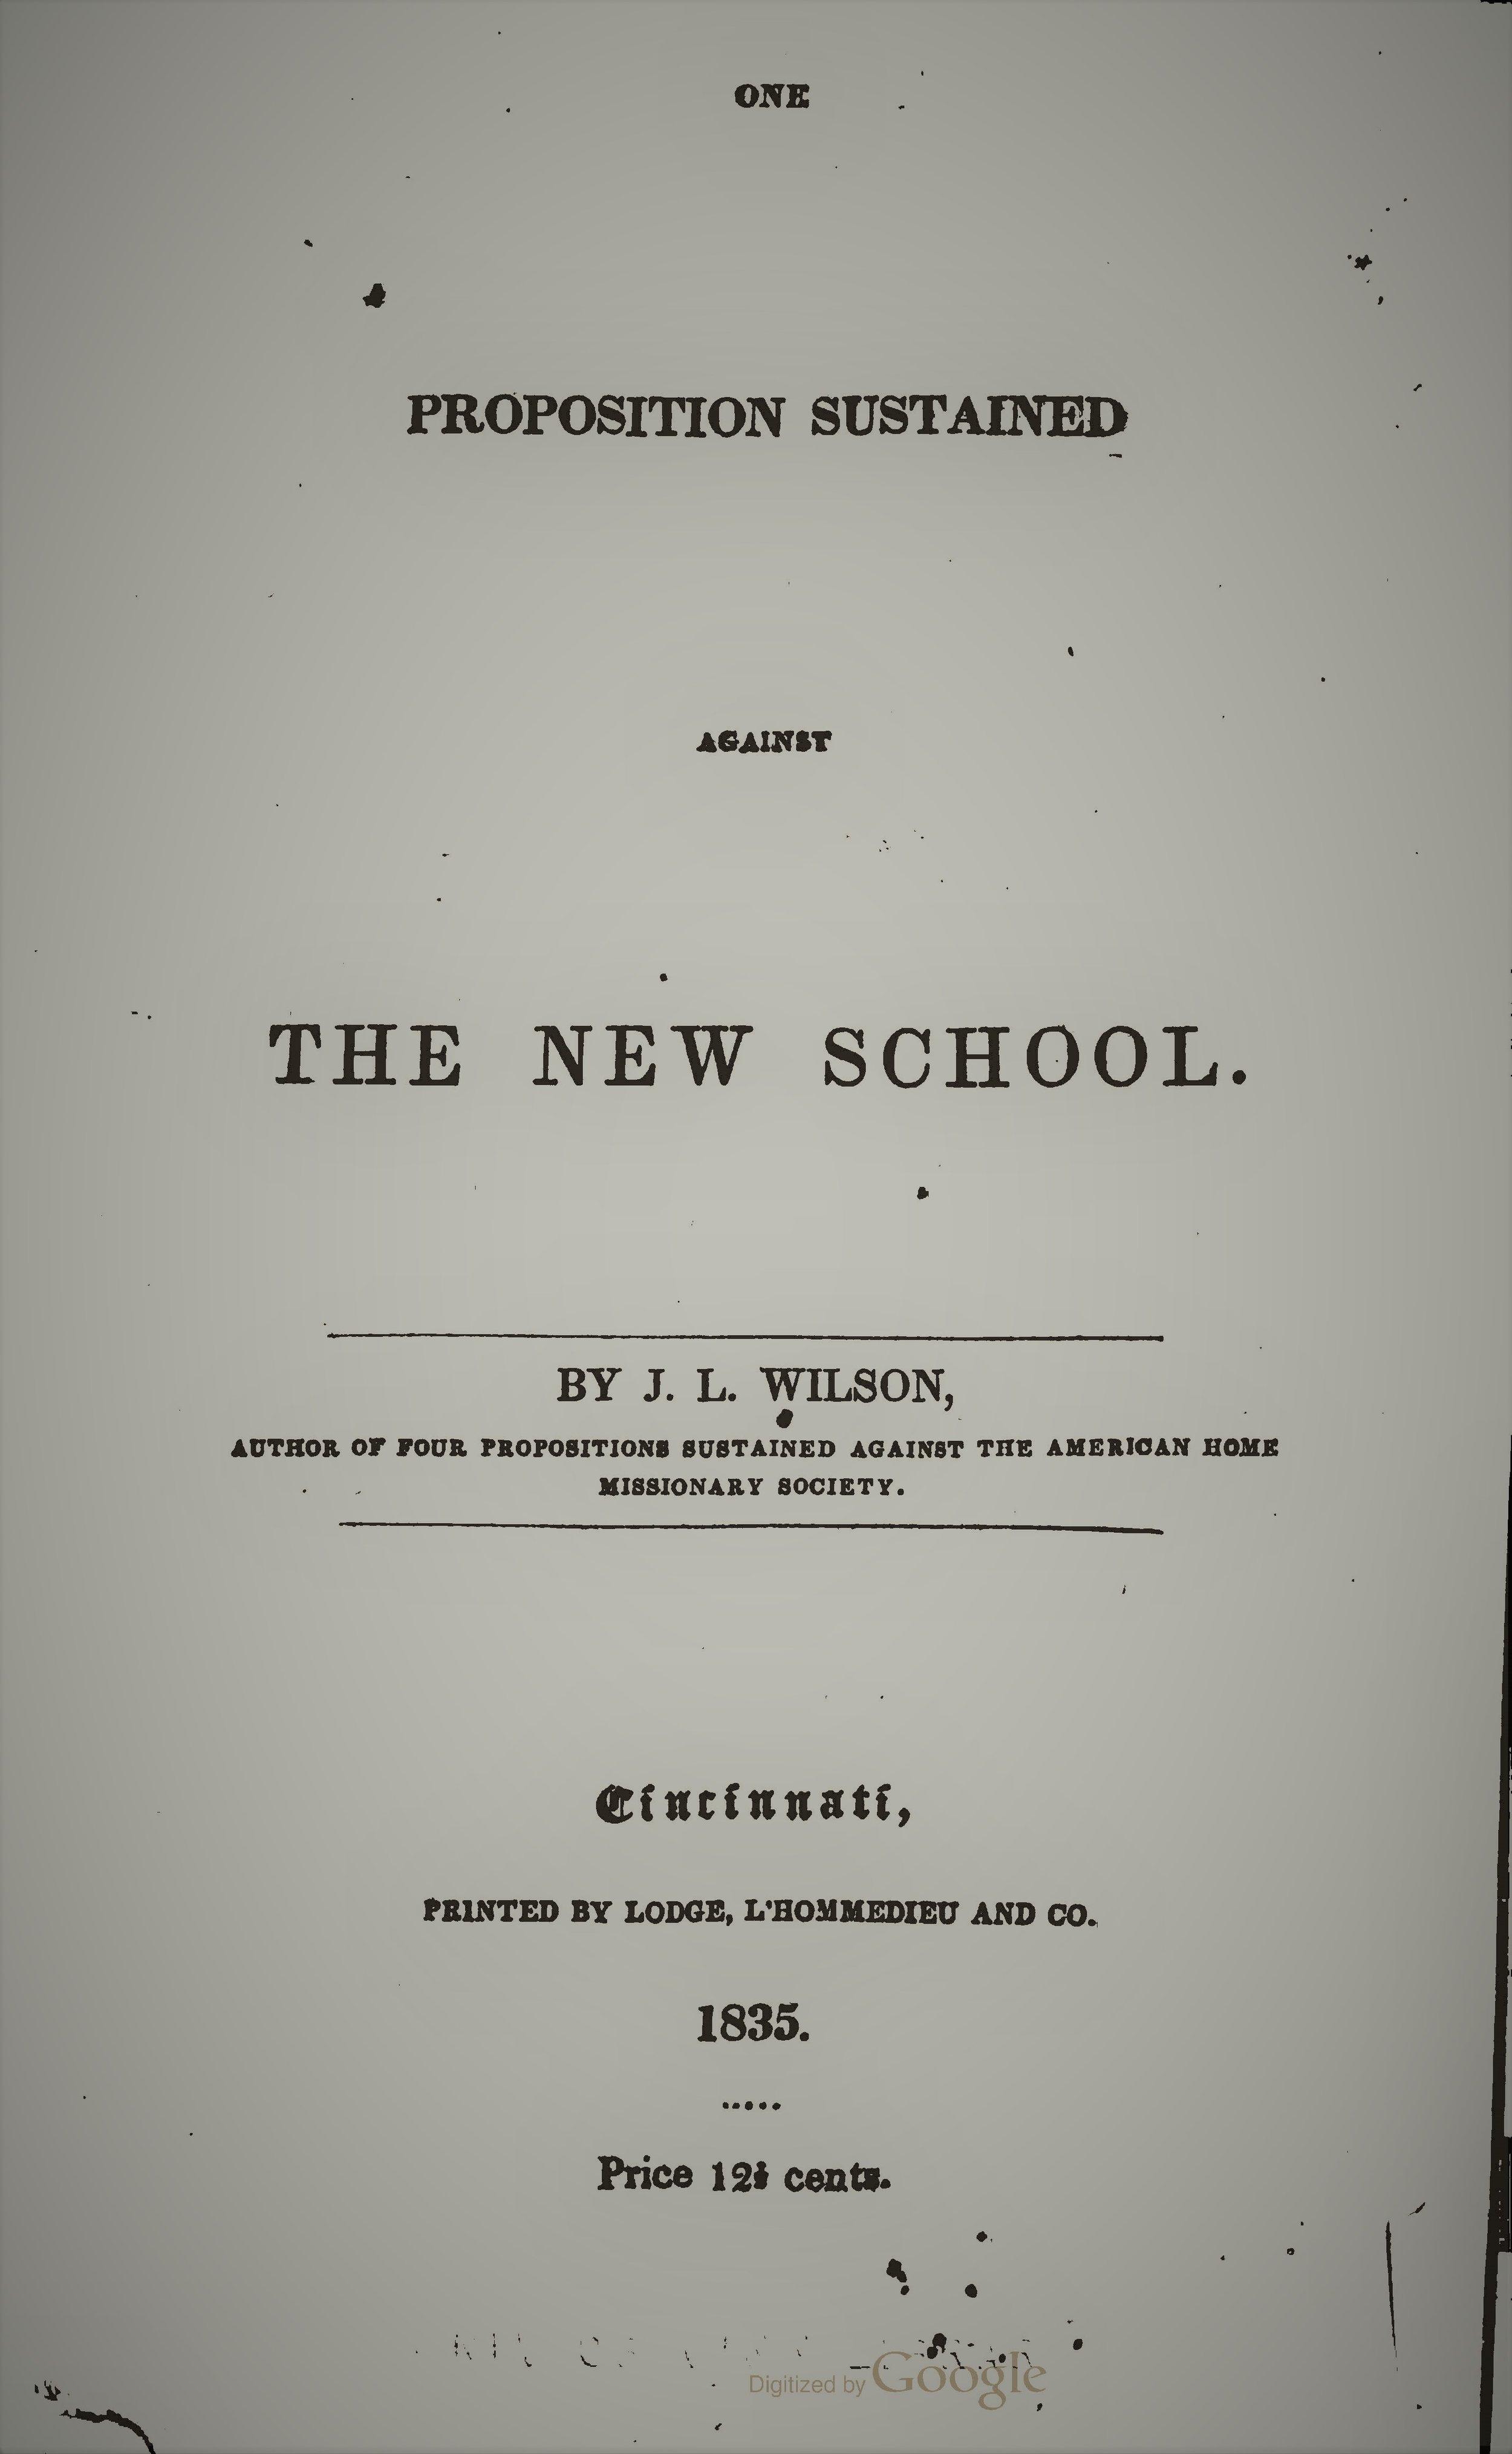 Wilson, Joshua Lacy - Proposition Against New School.jpg